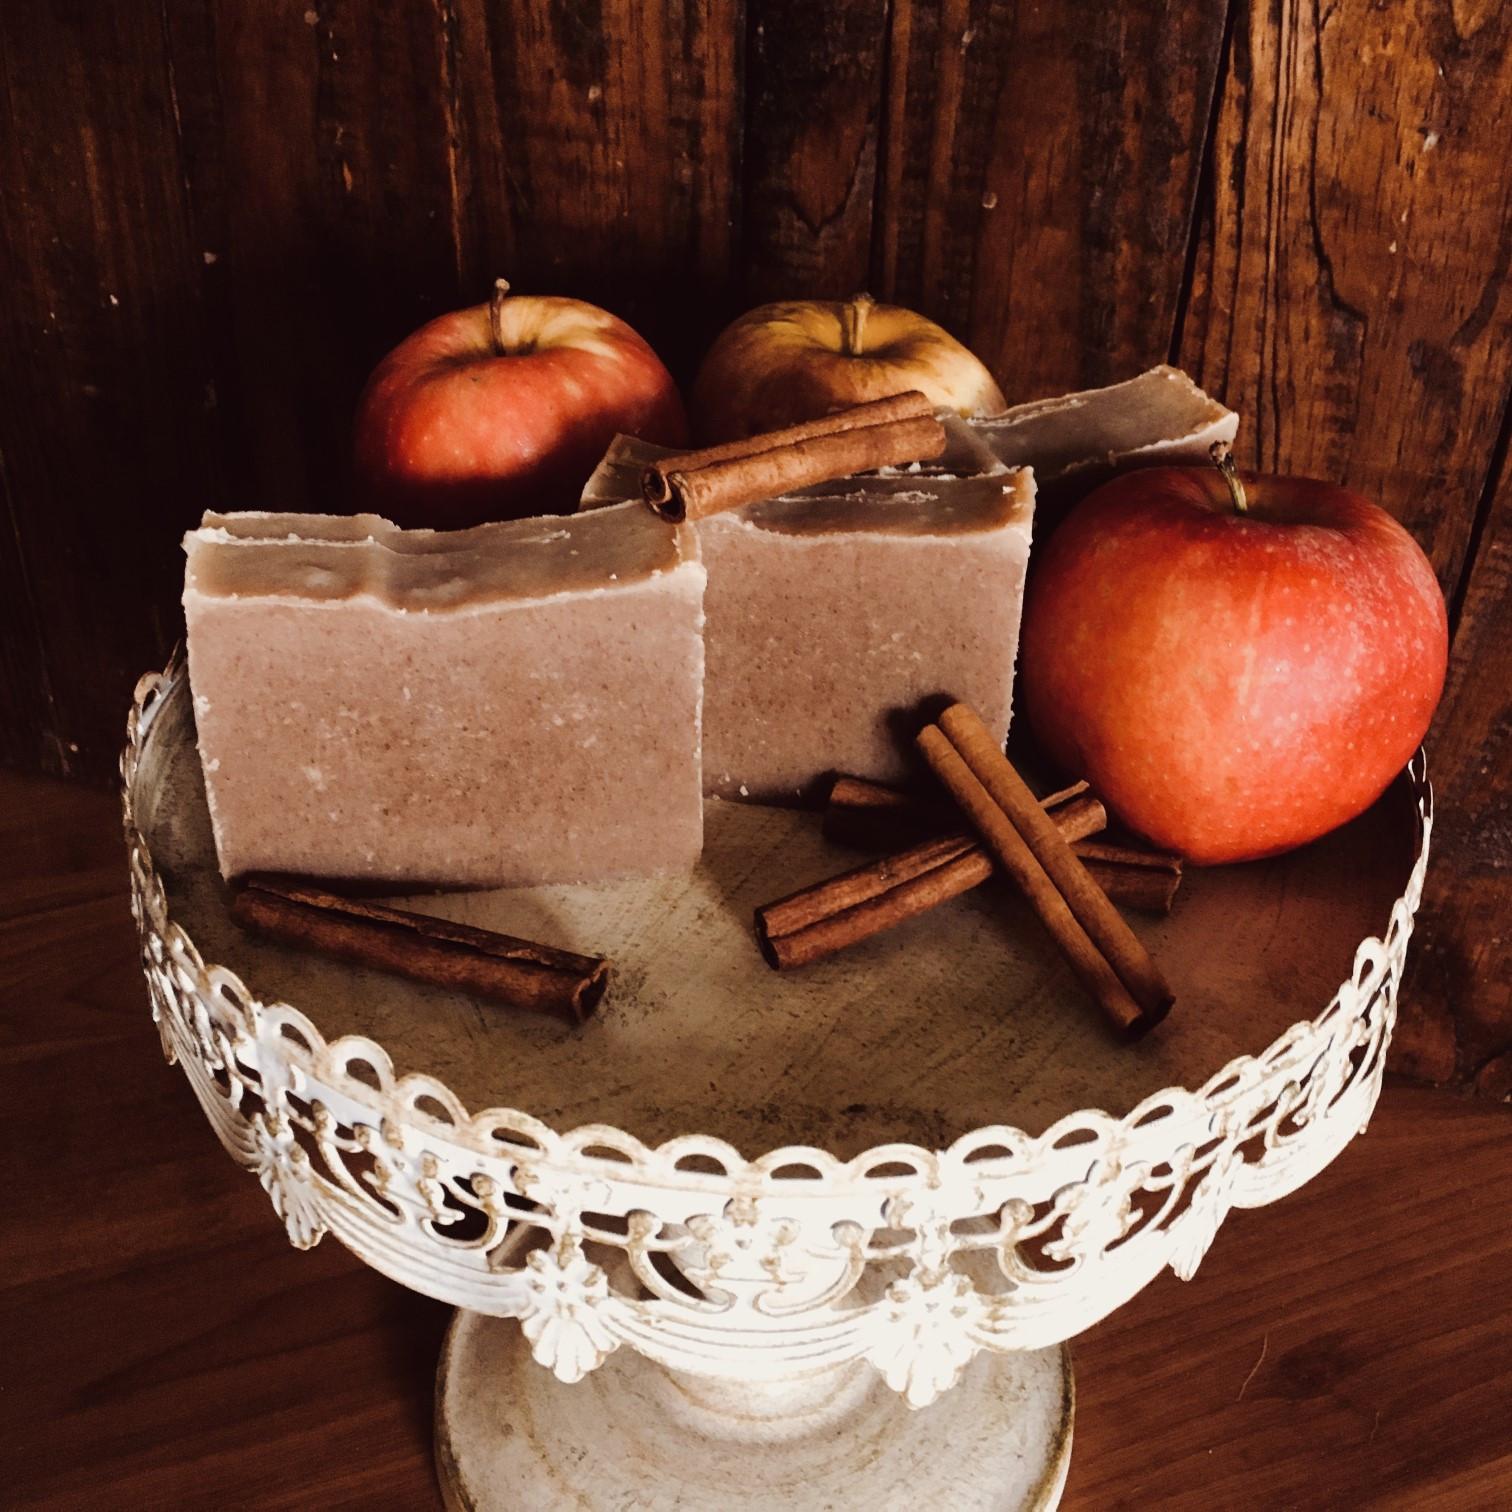 Milk Soap - Apple Pie